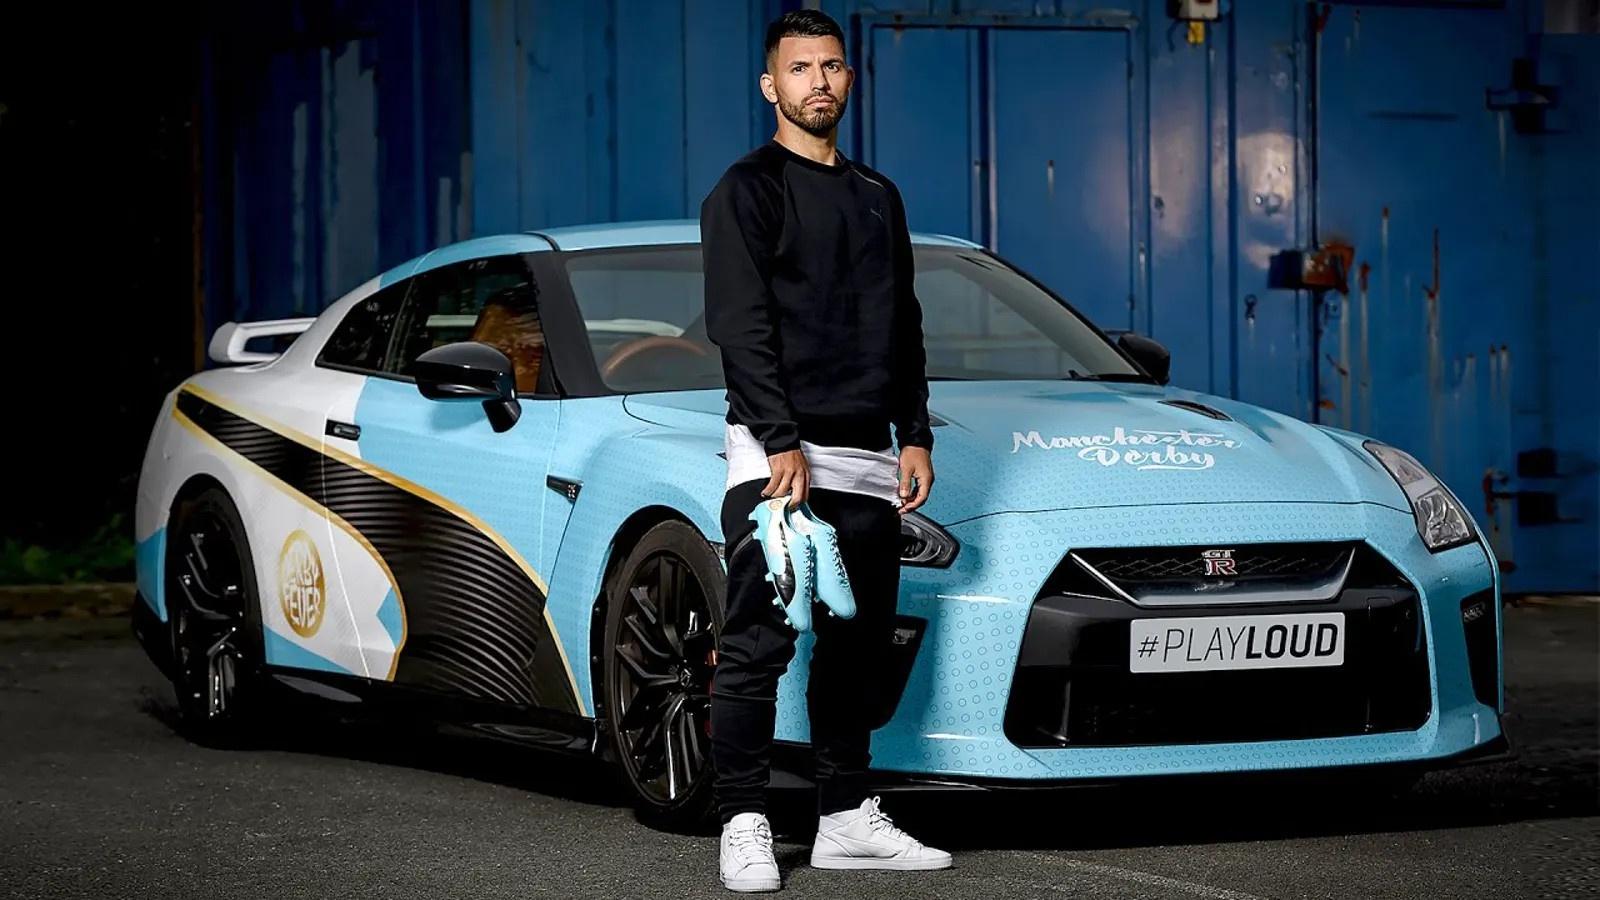 Cau thu Manchester City di xe gi anh 1